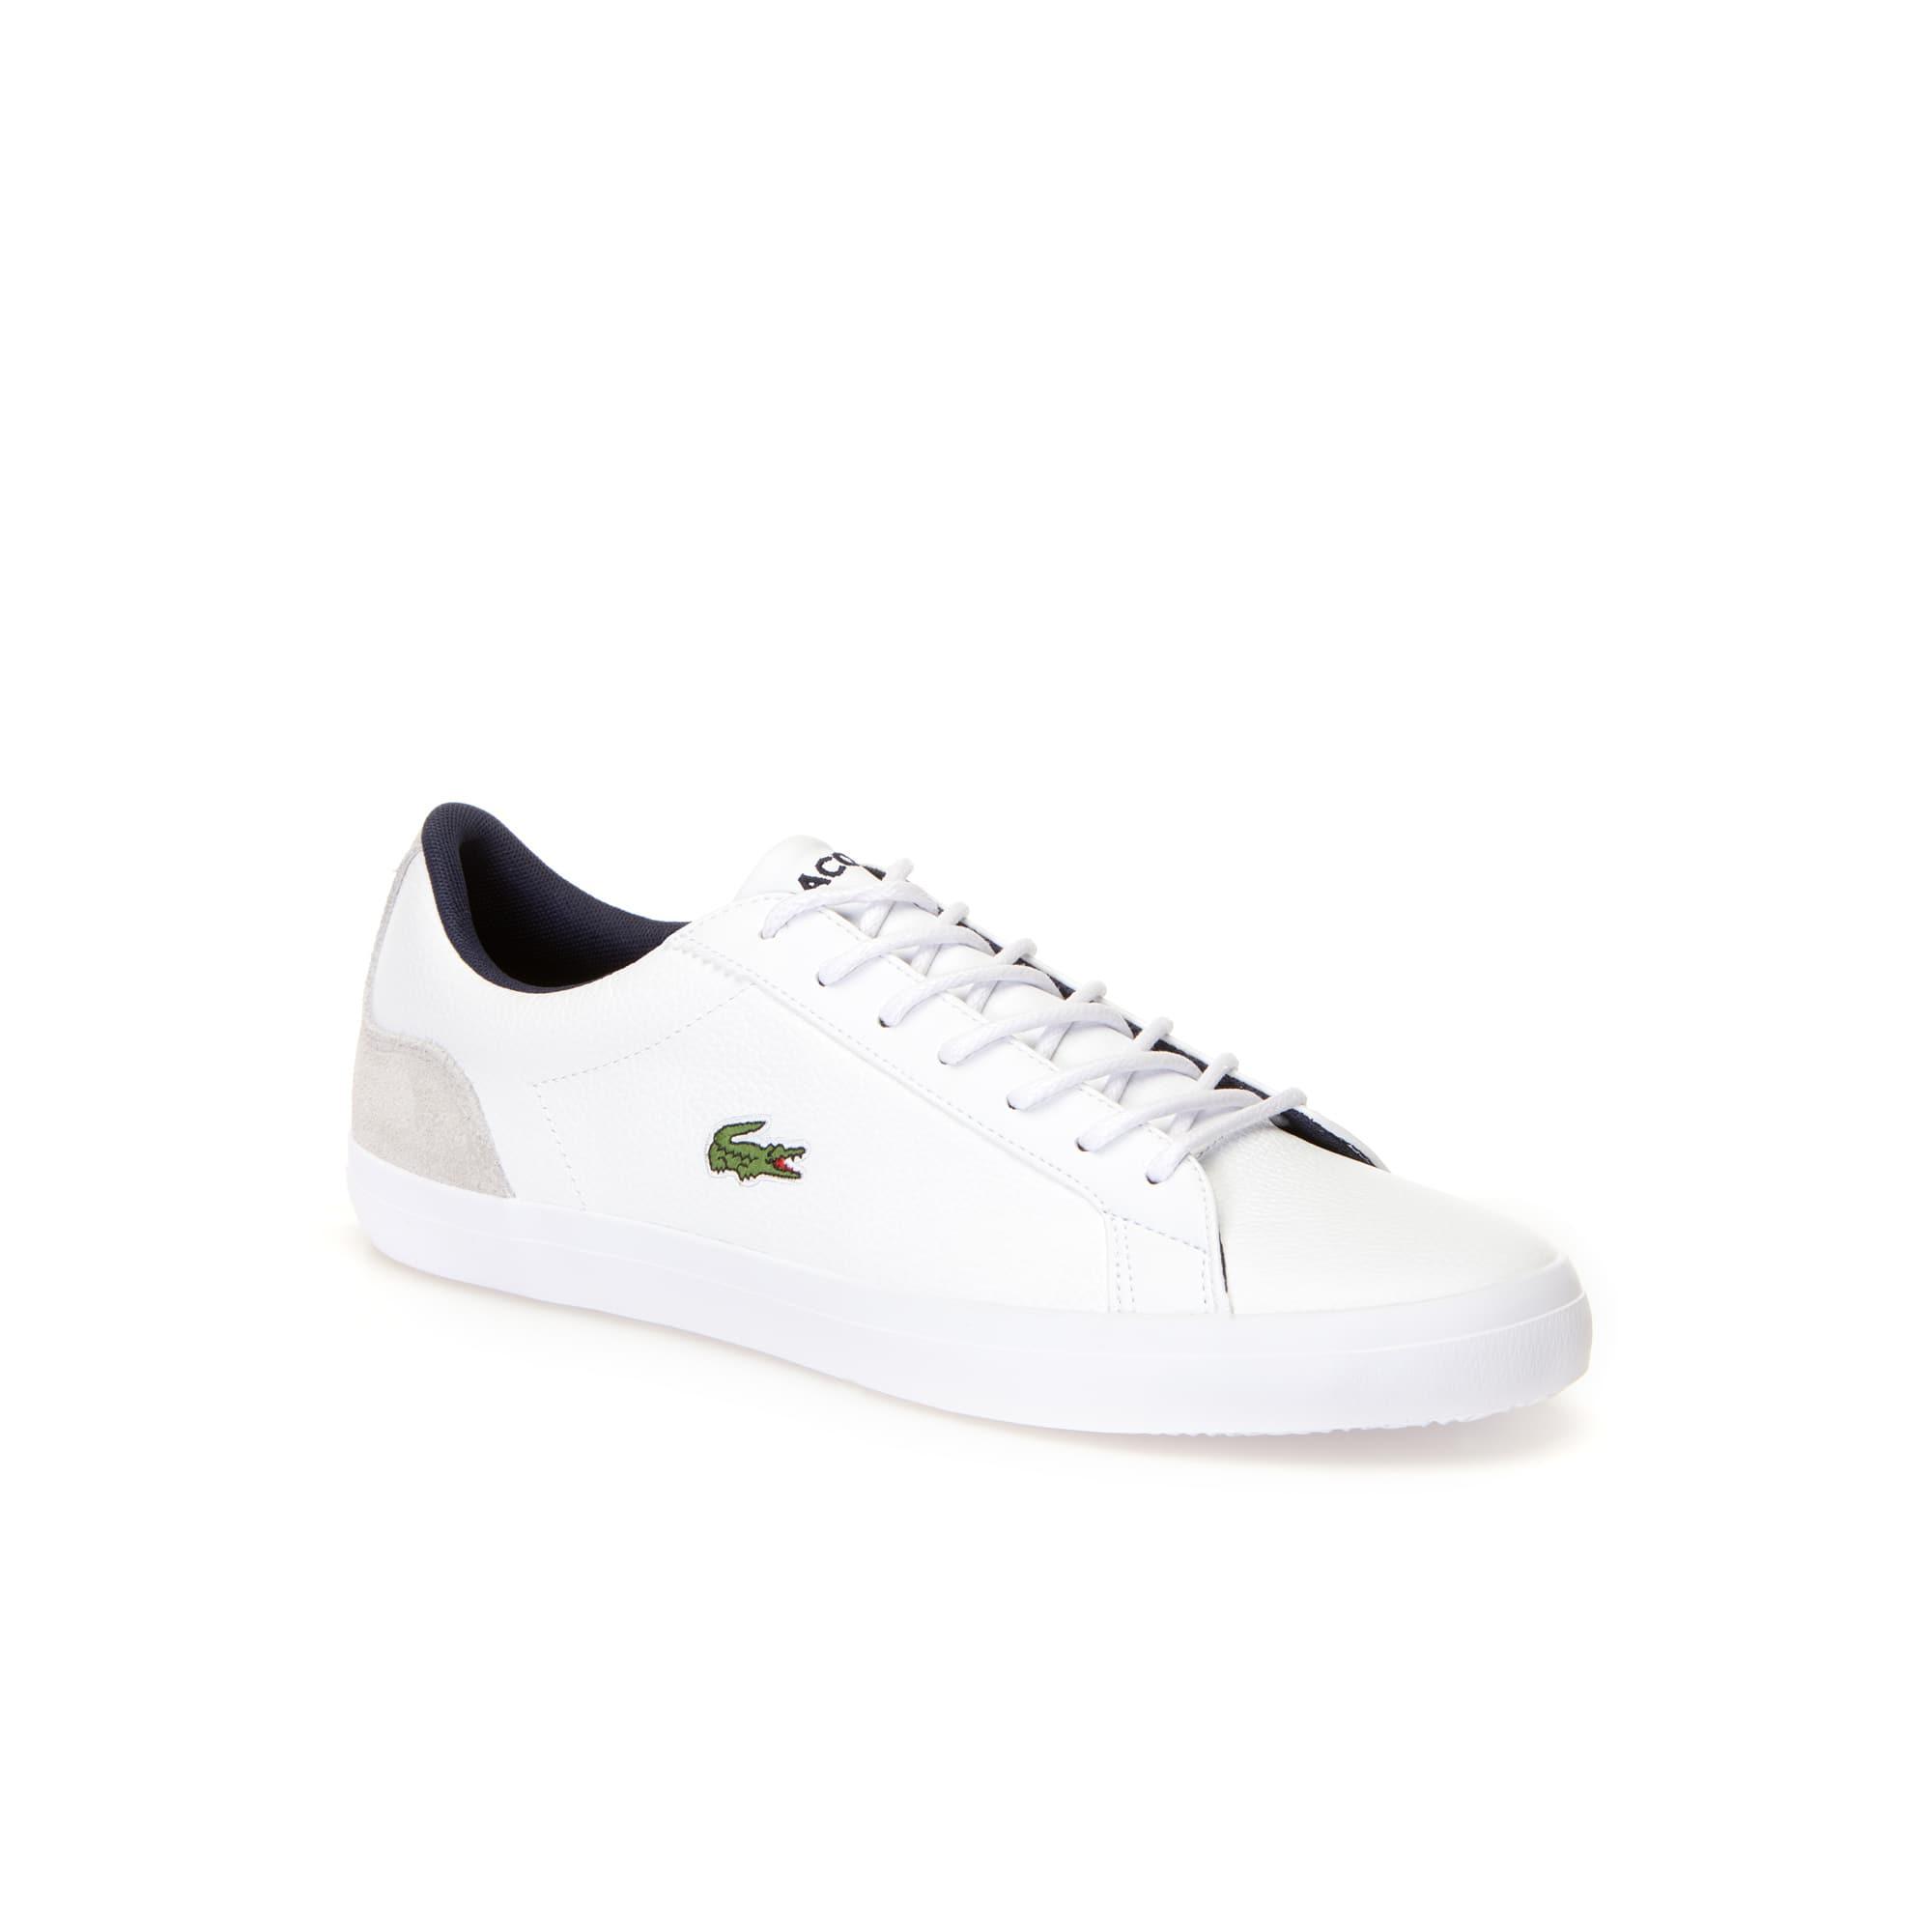 Herren-Sneakers LEROND aus Leder und Veloursleder